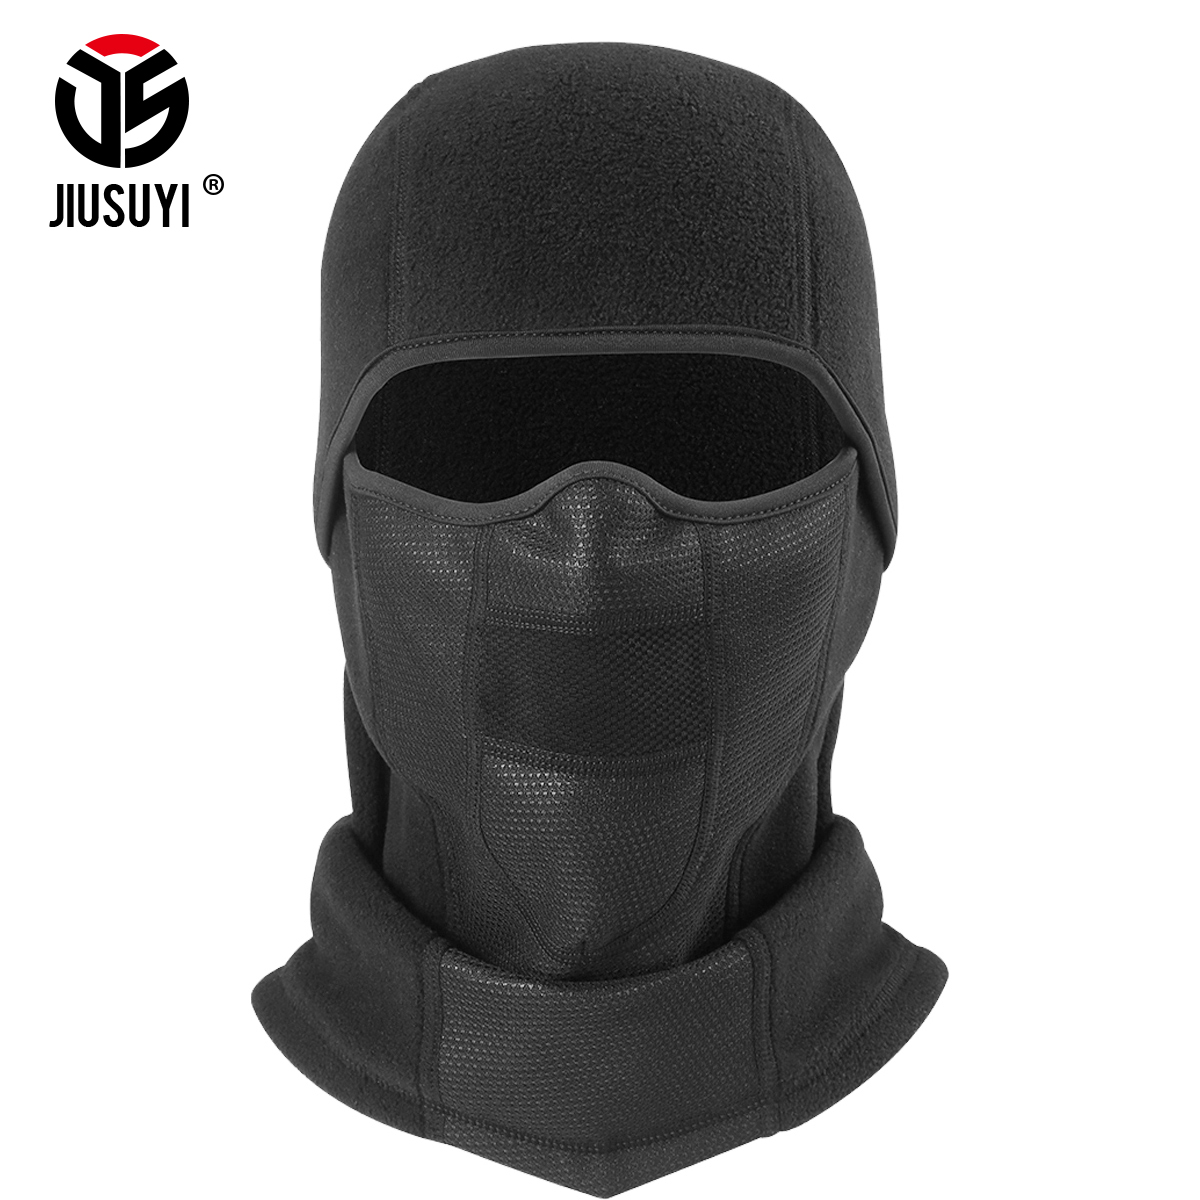 7188d8ef5ba Cold Weather Polar Fleece Balaclava Cap Mouth Ear Cover Winter Warmer  Bicycle Helmet Liner Full Face Mask Beanies Hats Men Women